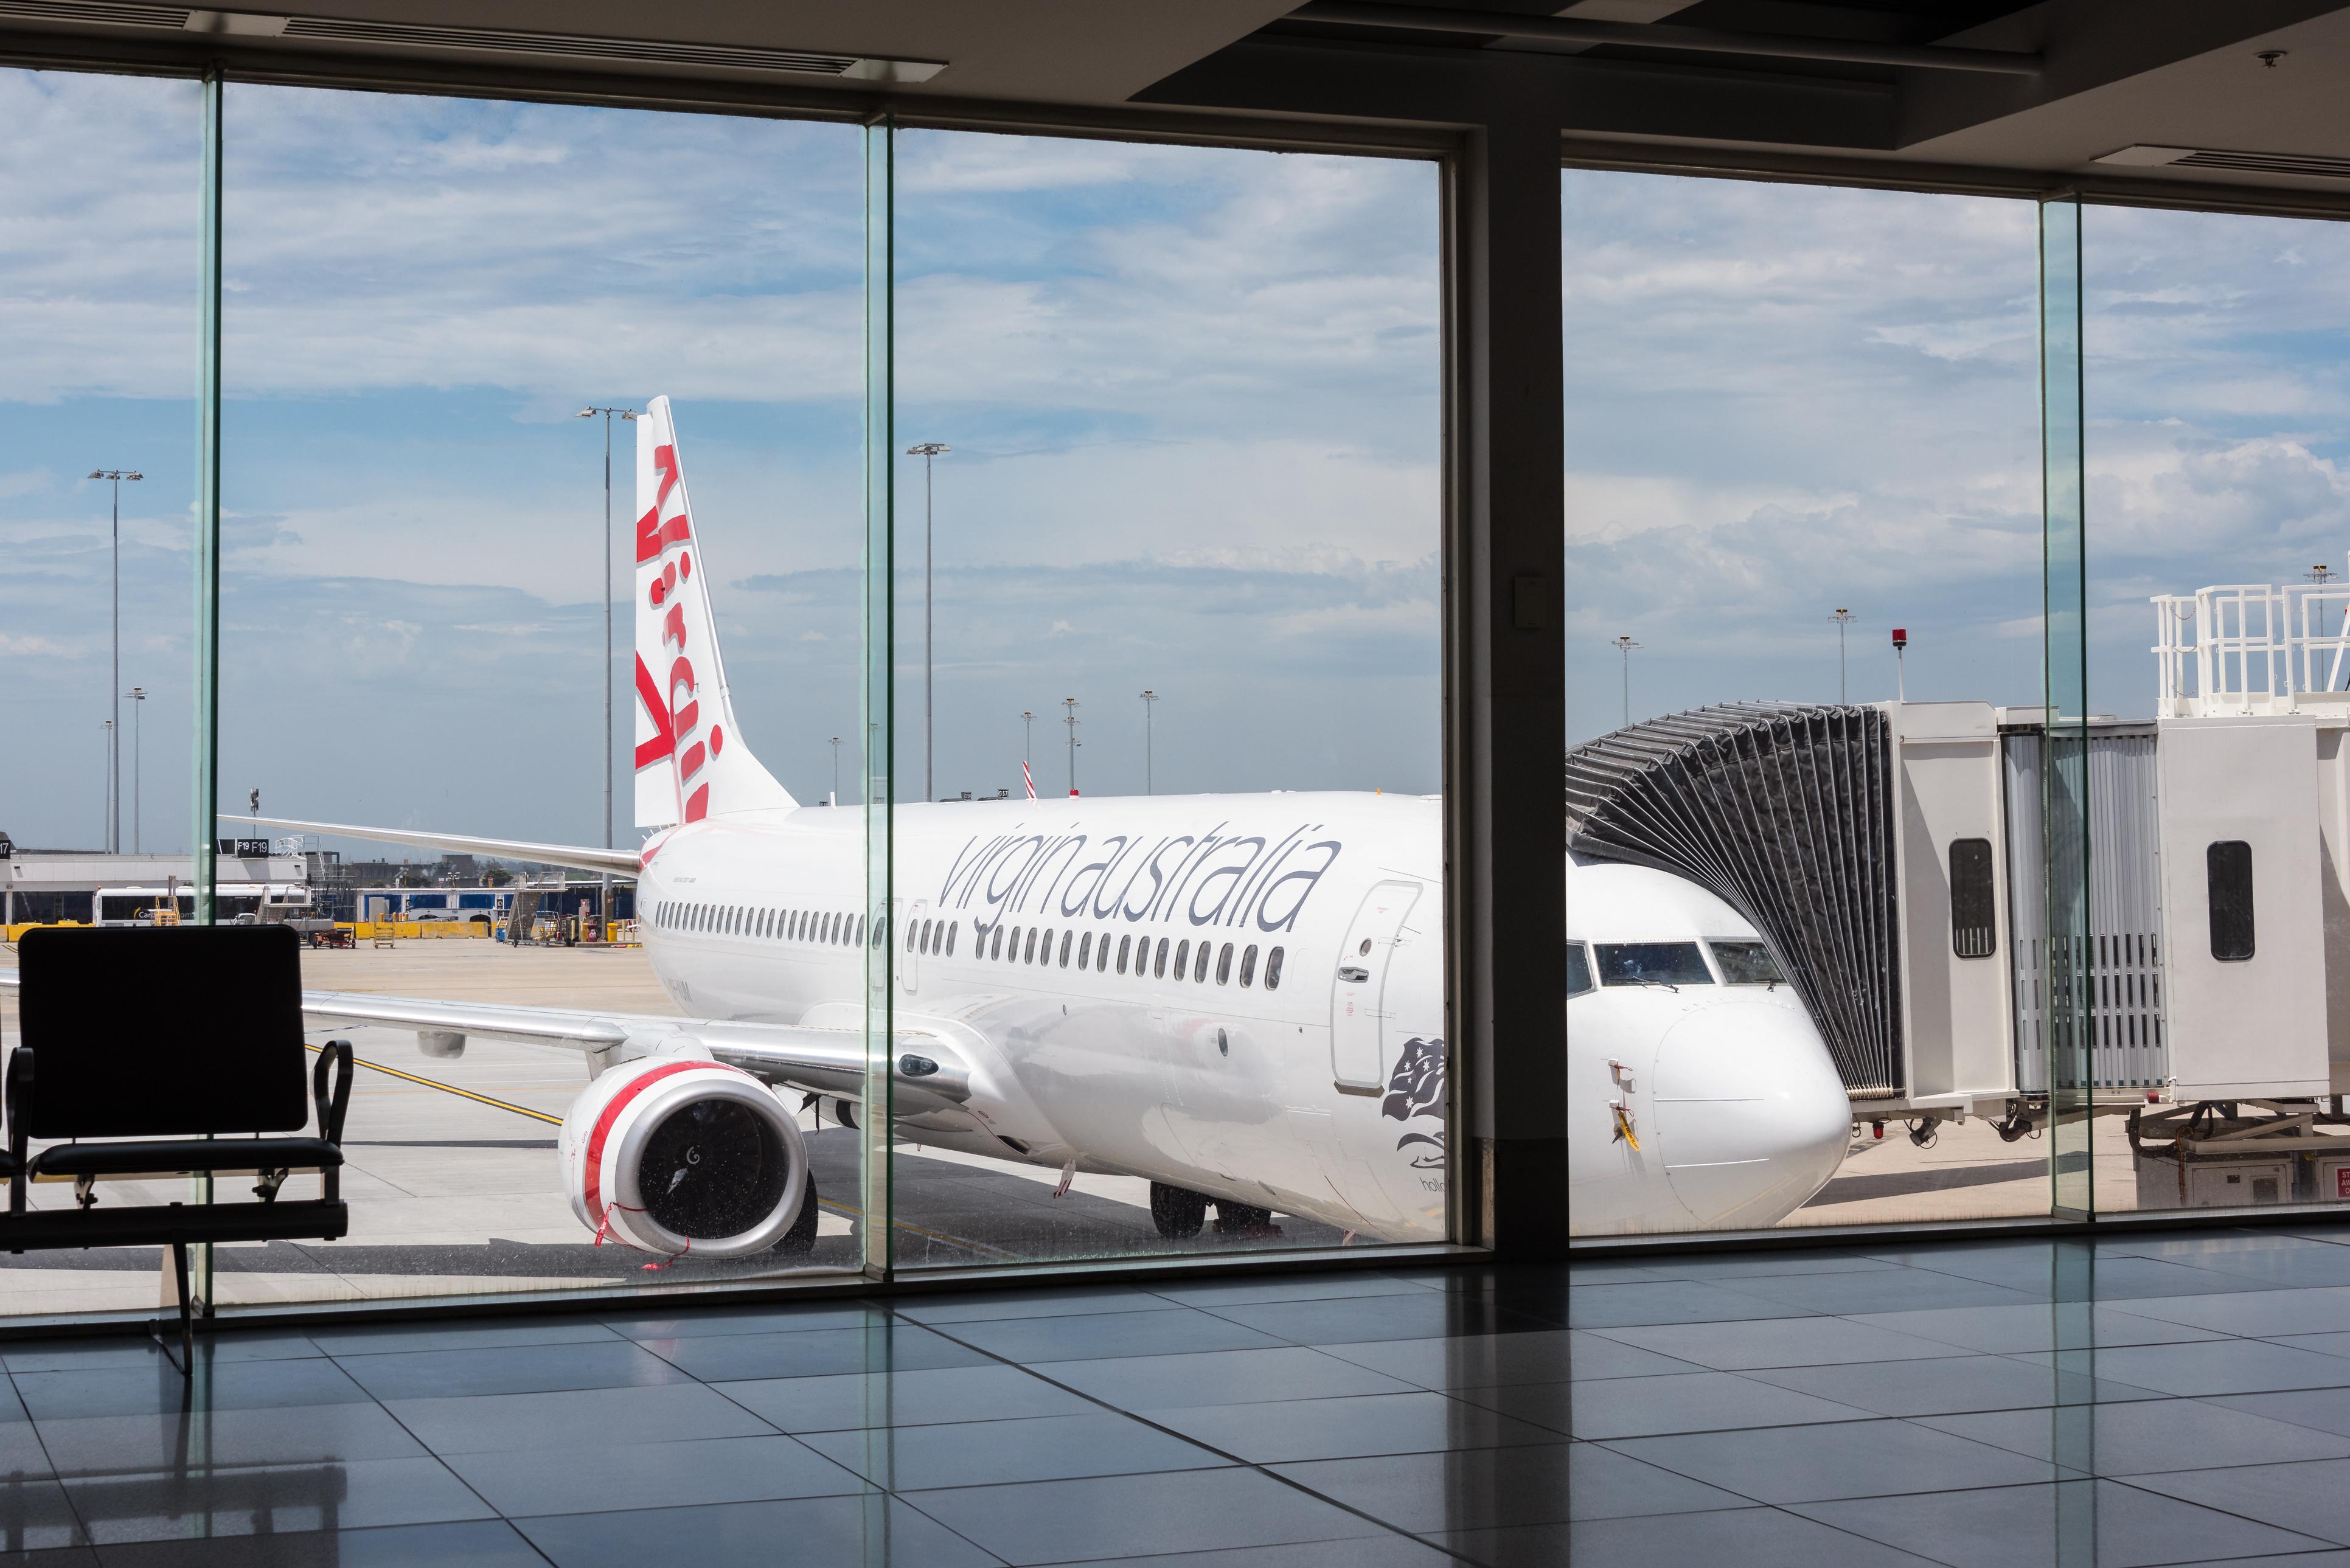 Article image for 'This is not Ansett': Hope held for Virgin Australia, despite administration announcement